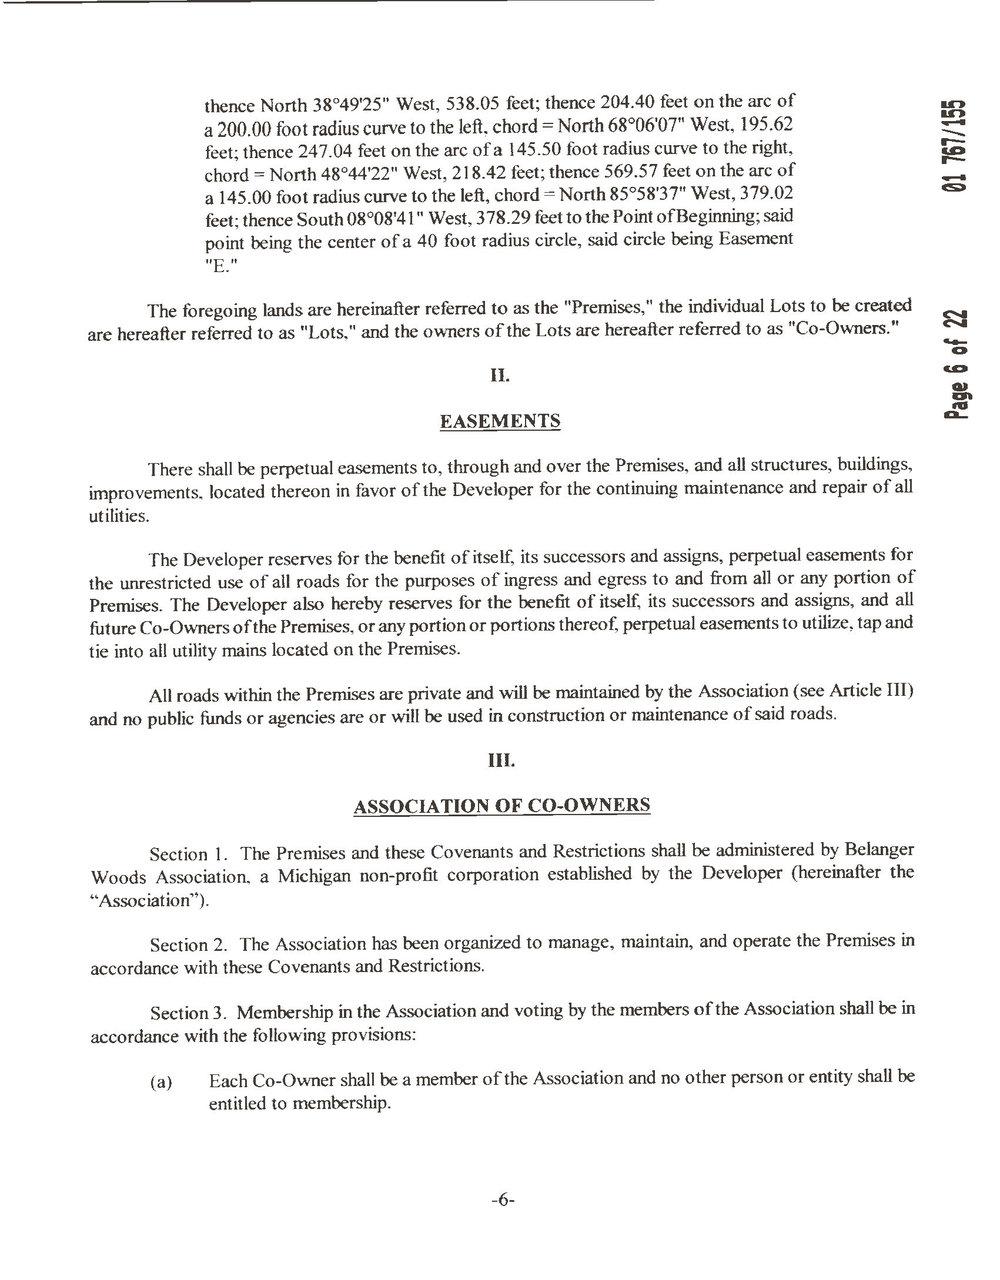 11635 E Belanger Woods Dr Marketing Packet - For Sale by Oltersdorf Realty LLC (26).jpg